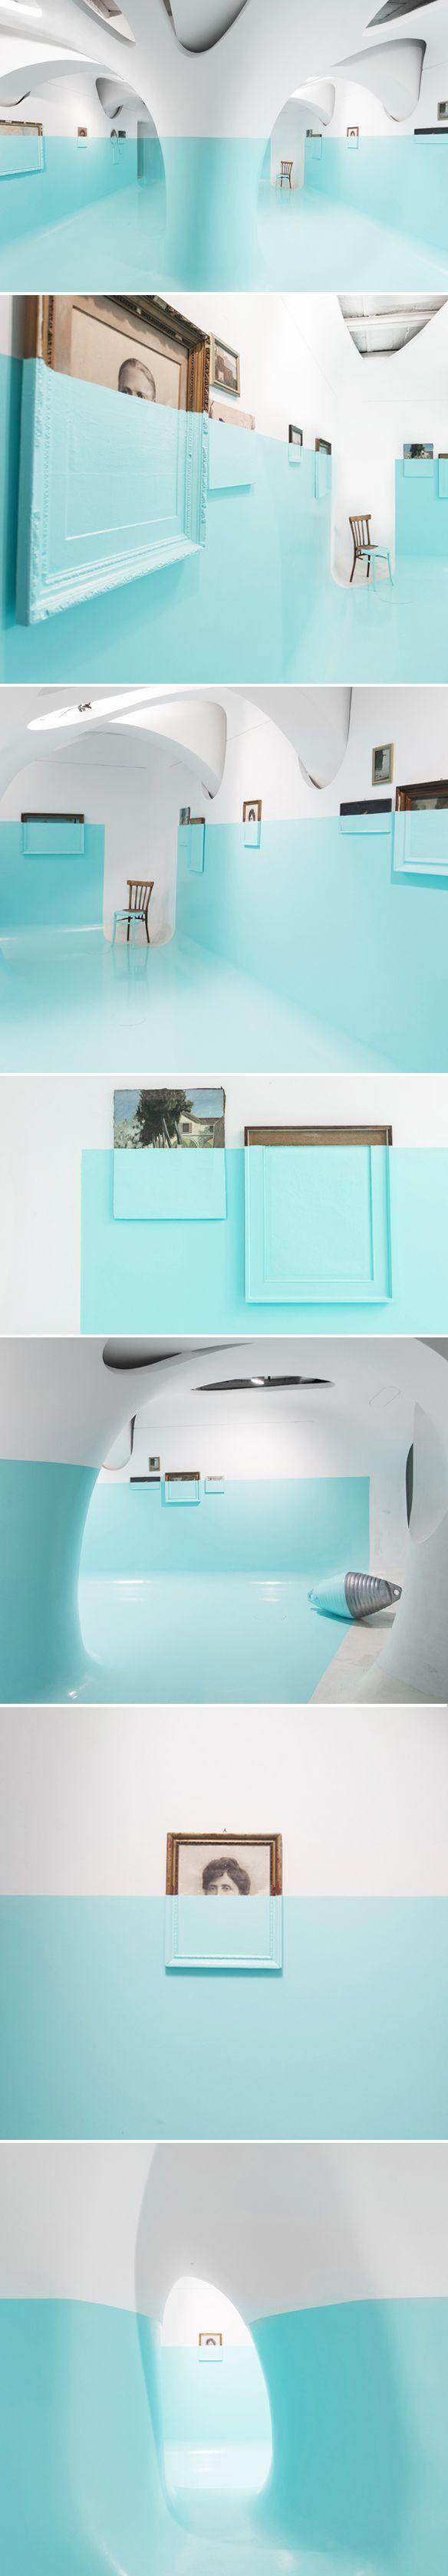 Davide d'elia - Tiffany blue boat like space filled installation